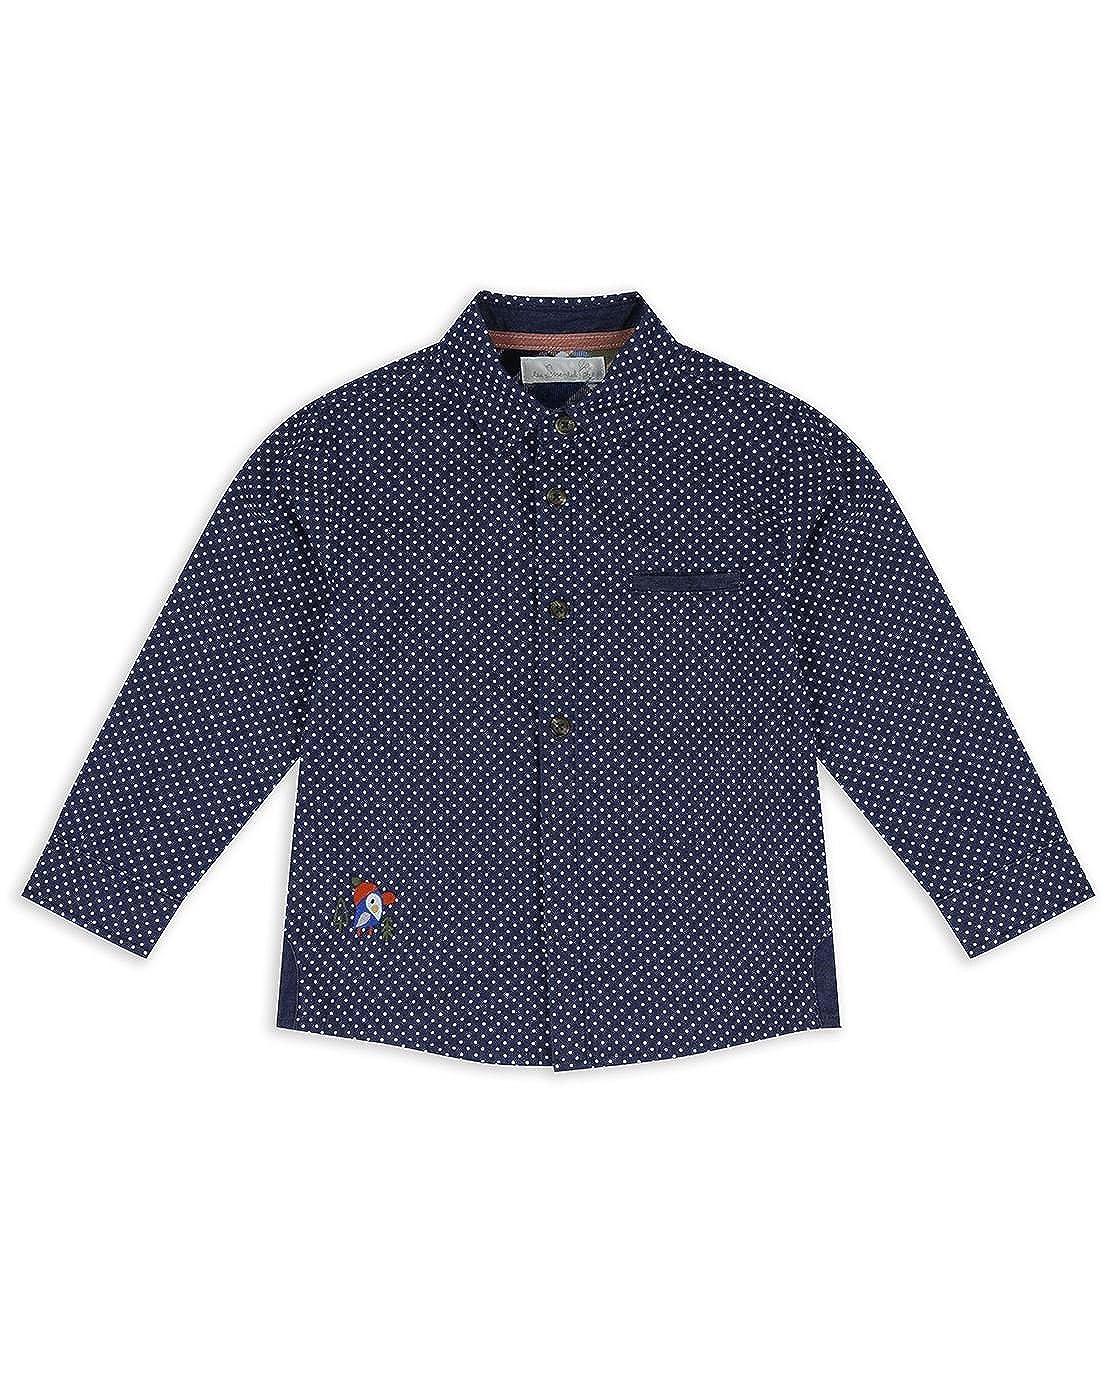 The Essential One Baby Kinder Jungen Hemd/Shirt Langarm - Blau - EOT452